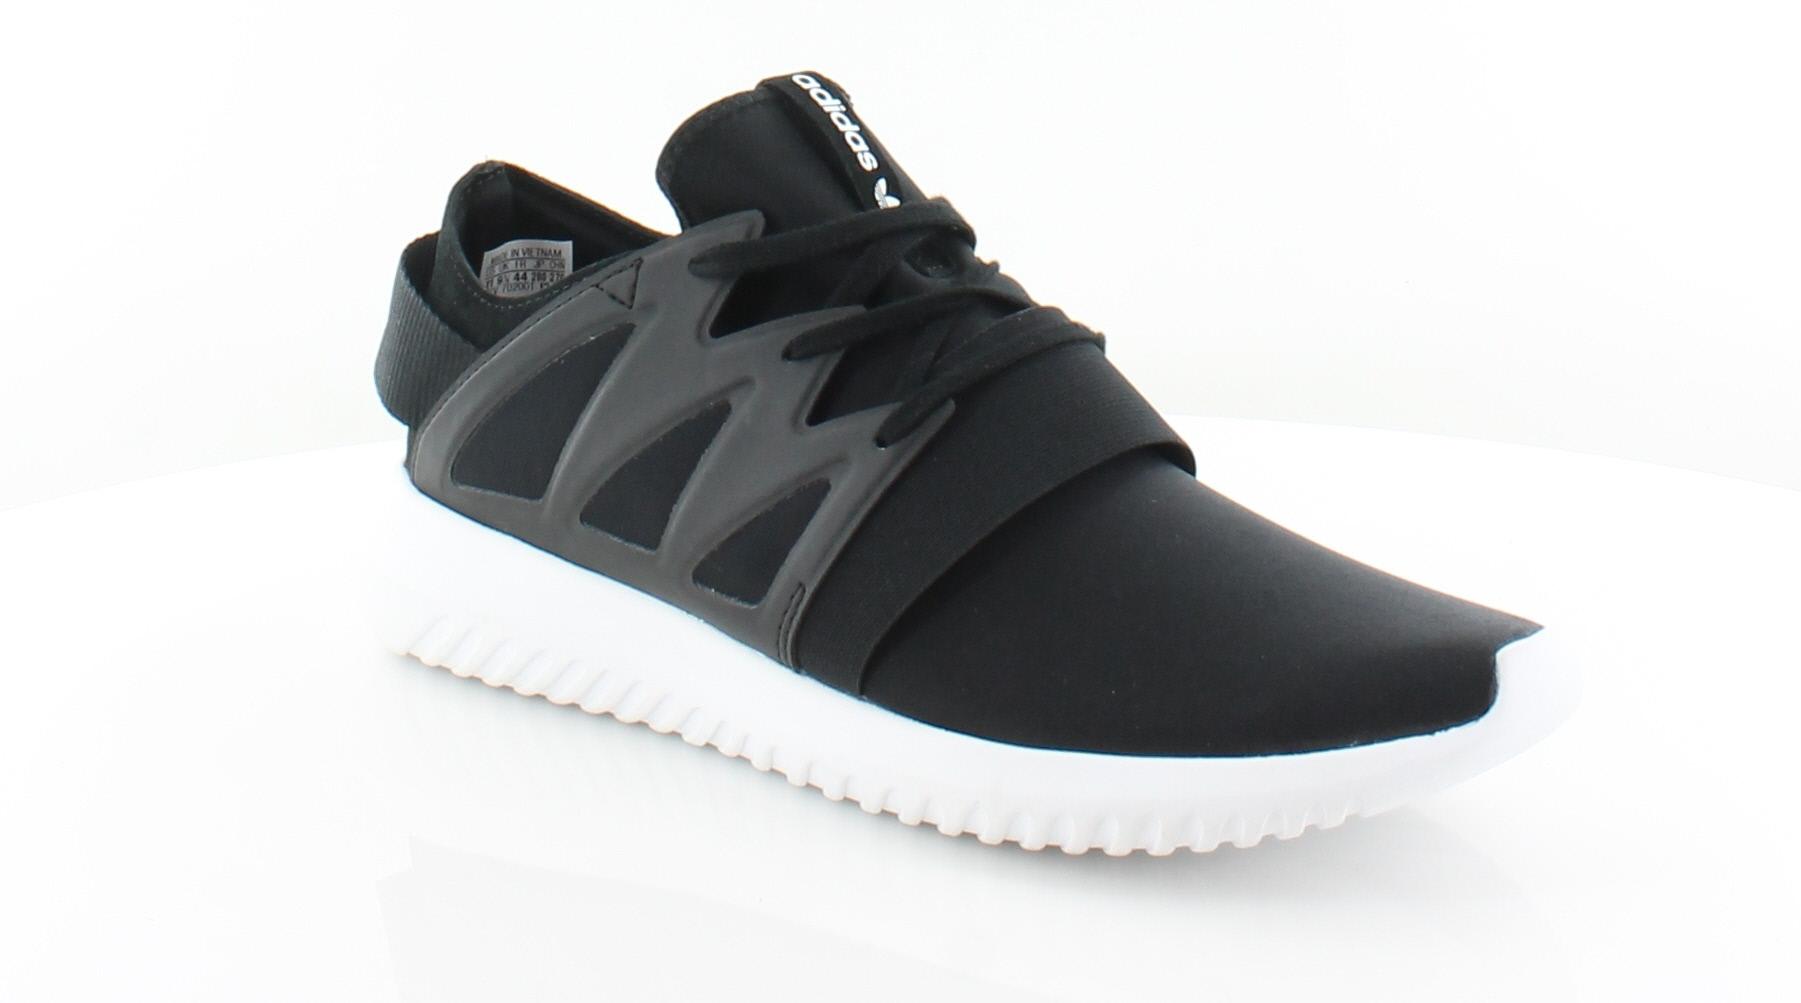 c2493162c57d Adidas Tubular Viral Women s Athletic Core black